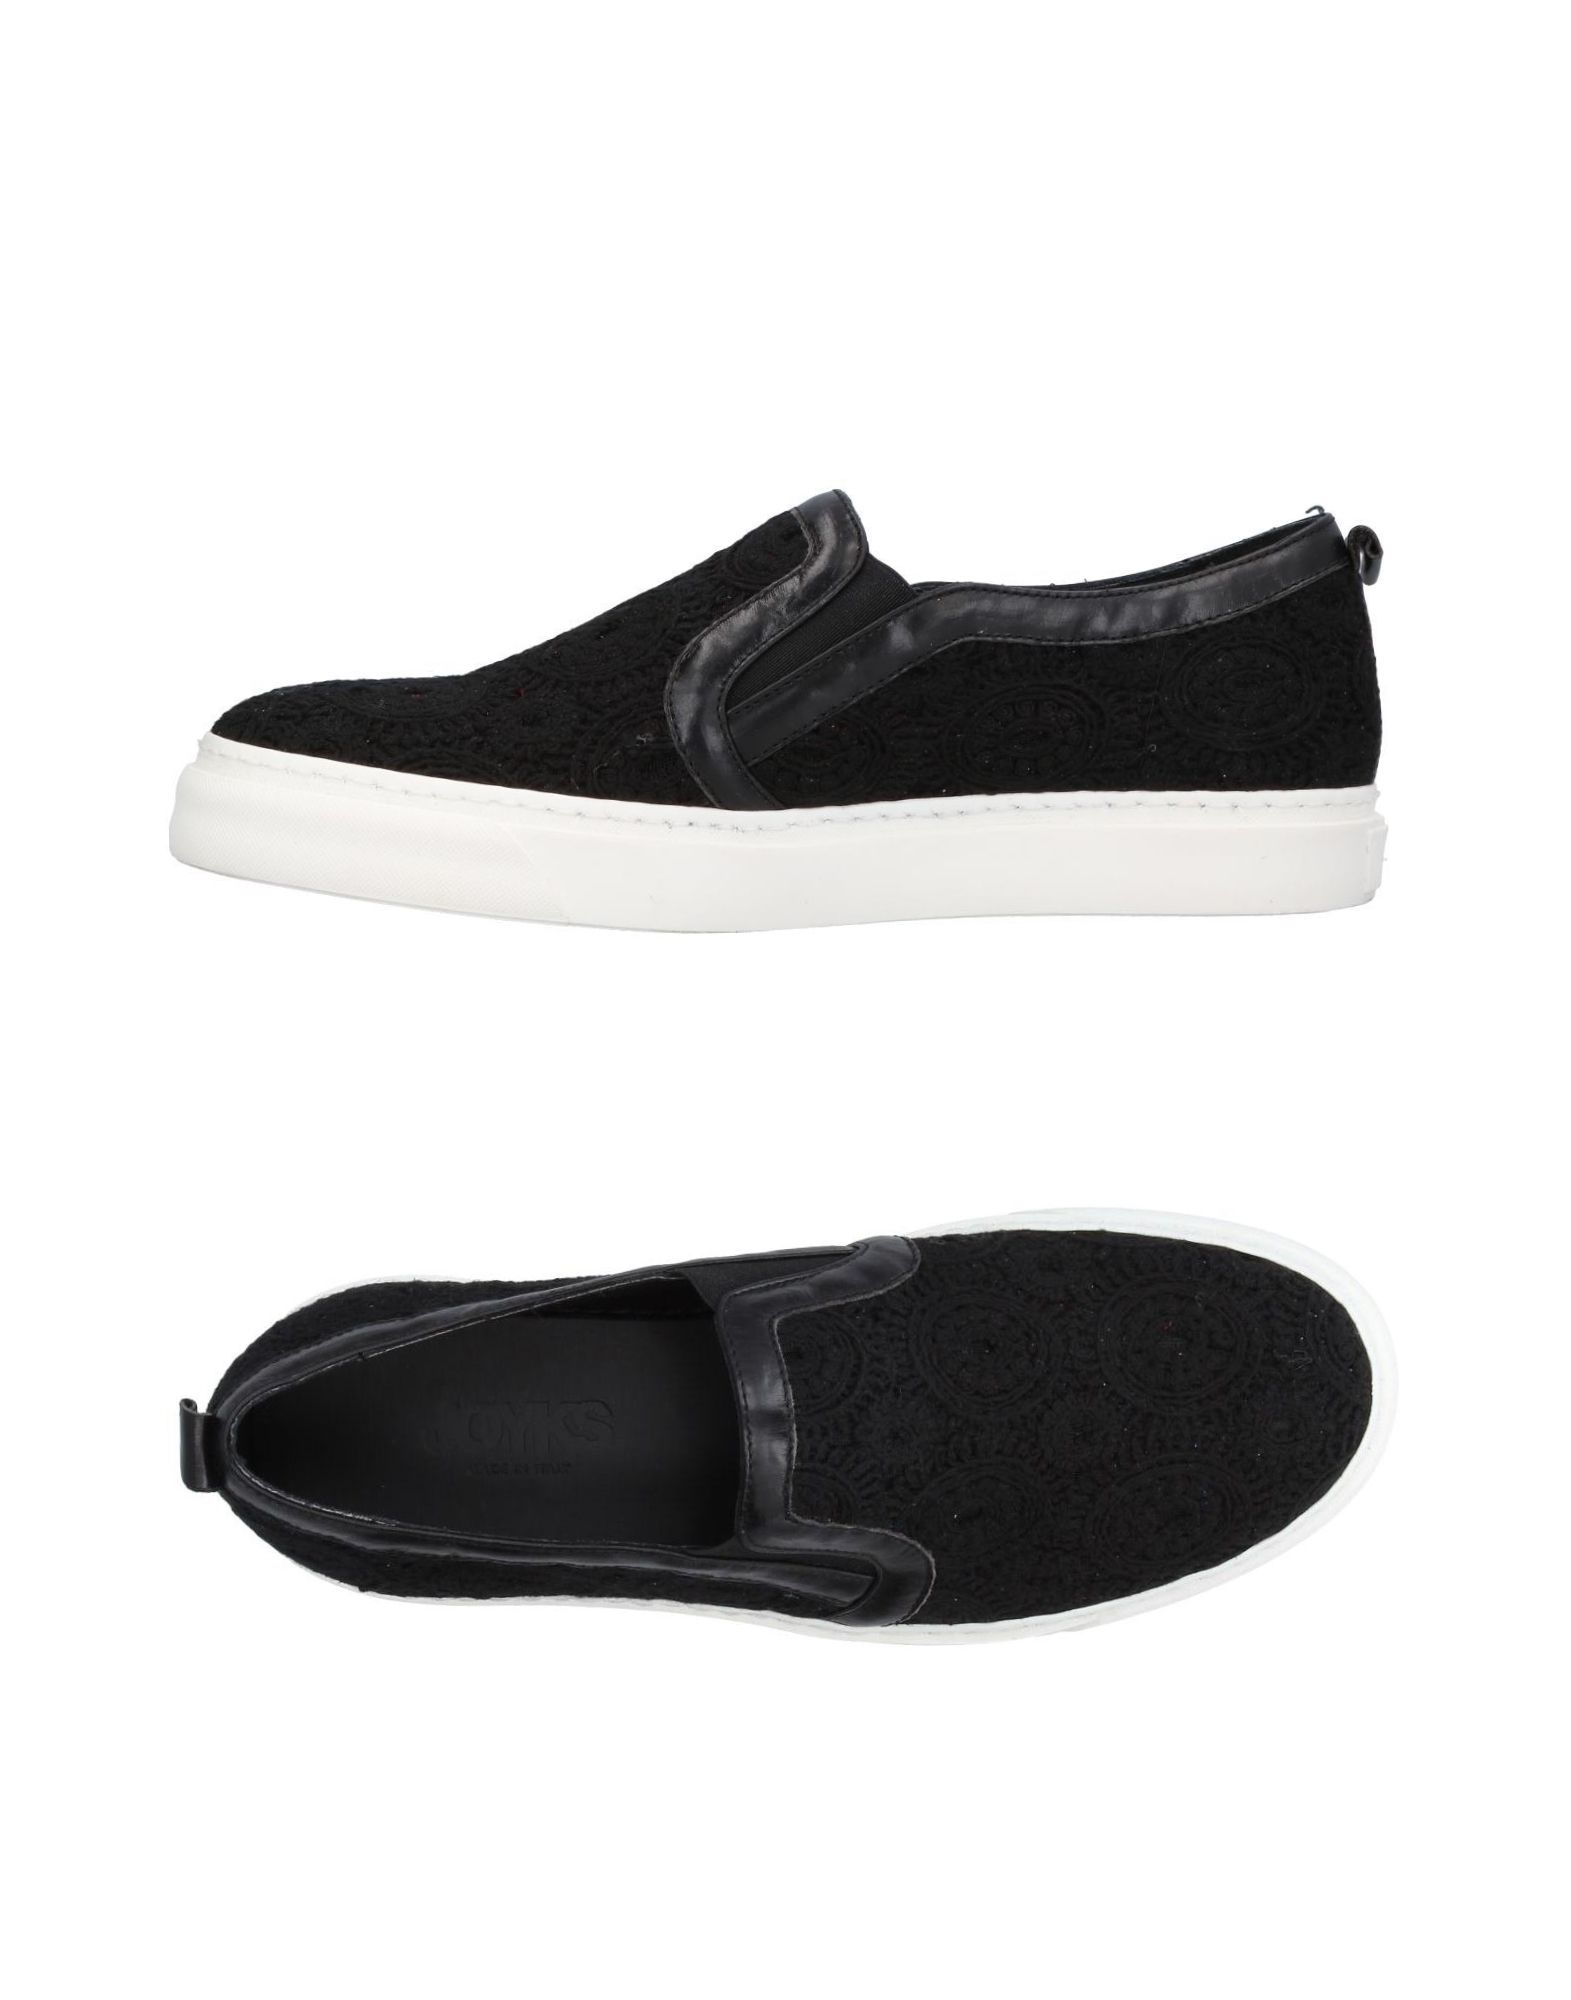 Joyks Sneakers Damen Damen Sneakers  11405542UN a0b8ce